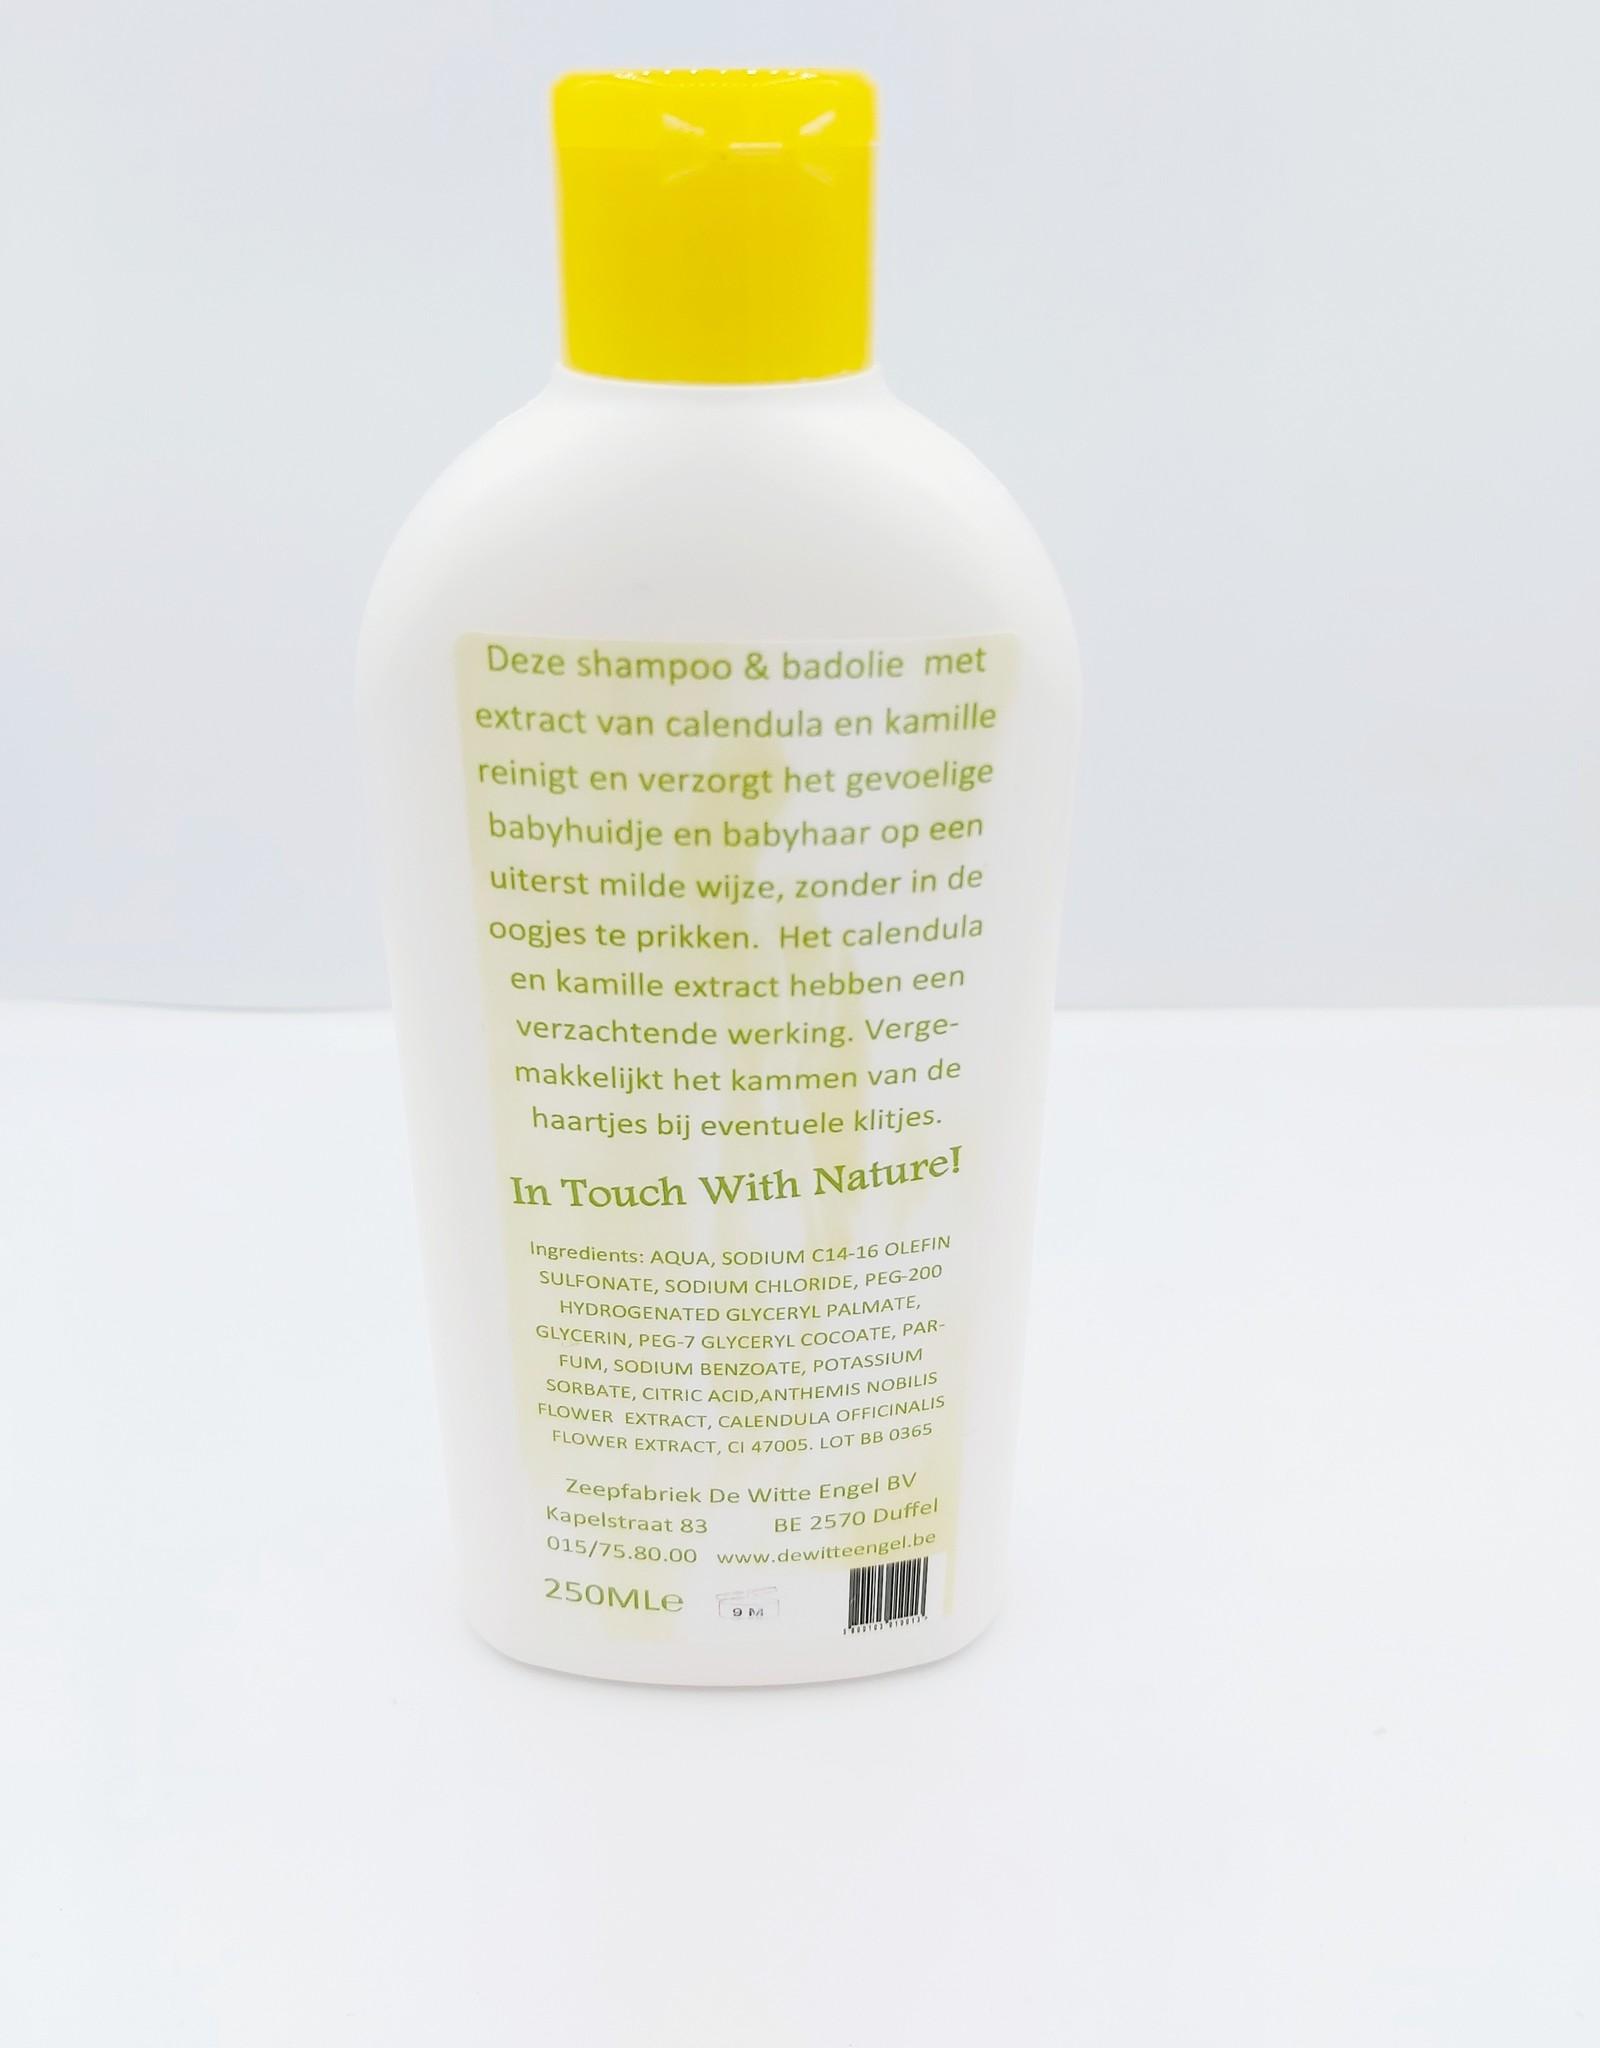 De Witte Engel Babyshampoo & badoil